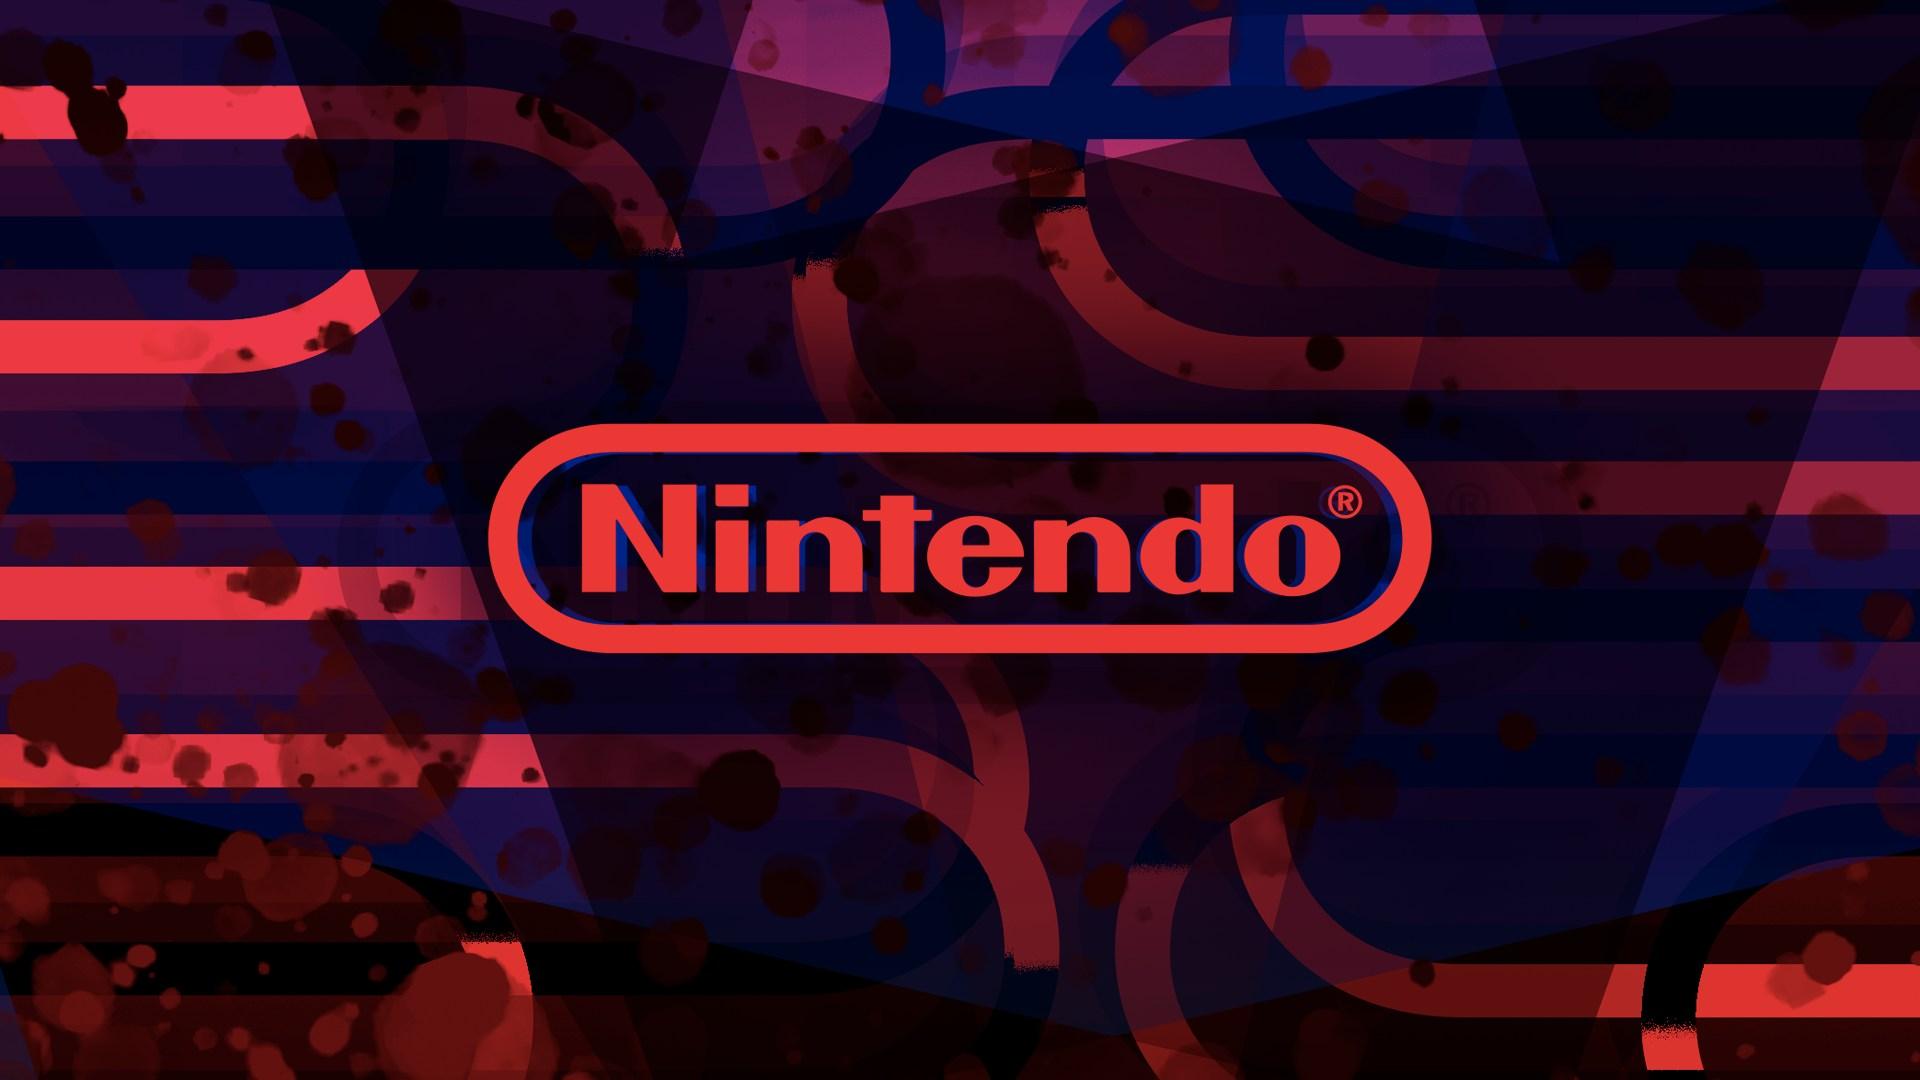 Gaming, Konsole, Logo, Nintendo, Spielekonsole, Spielekonsolen, Nintendo Switch, Switch, Nintendo Konsole, Rot, Nintendo Logo